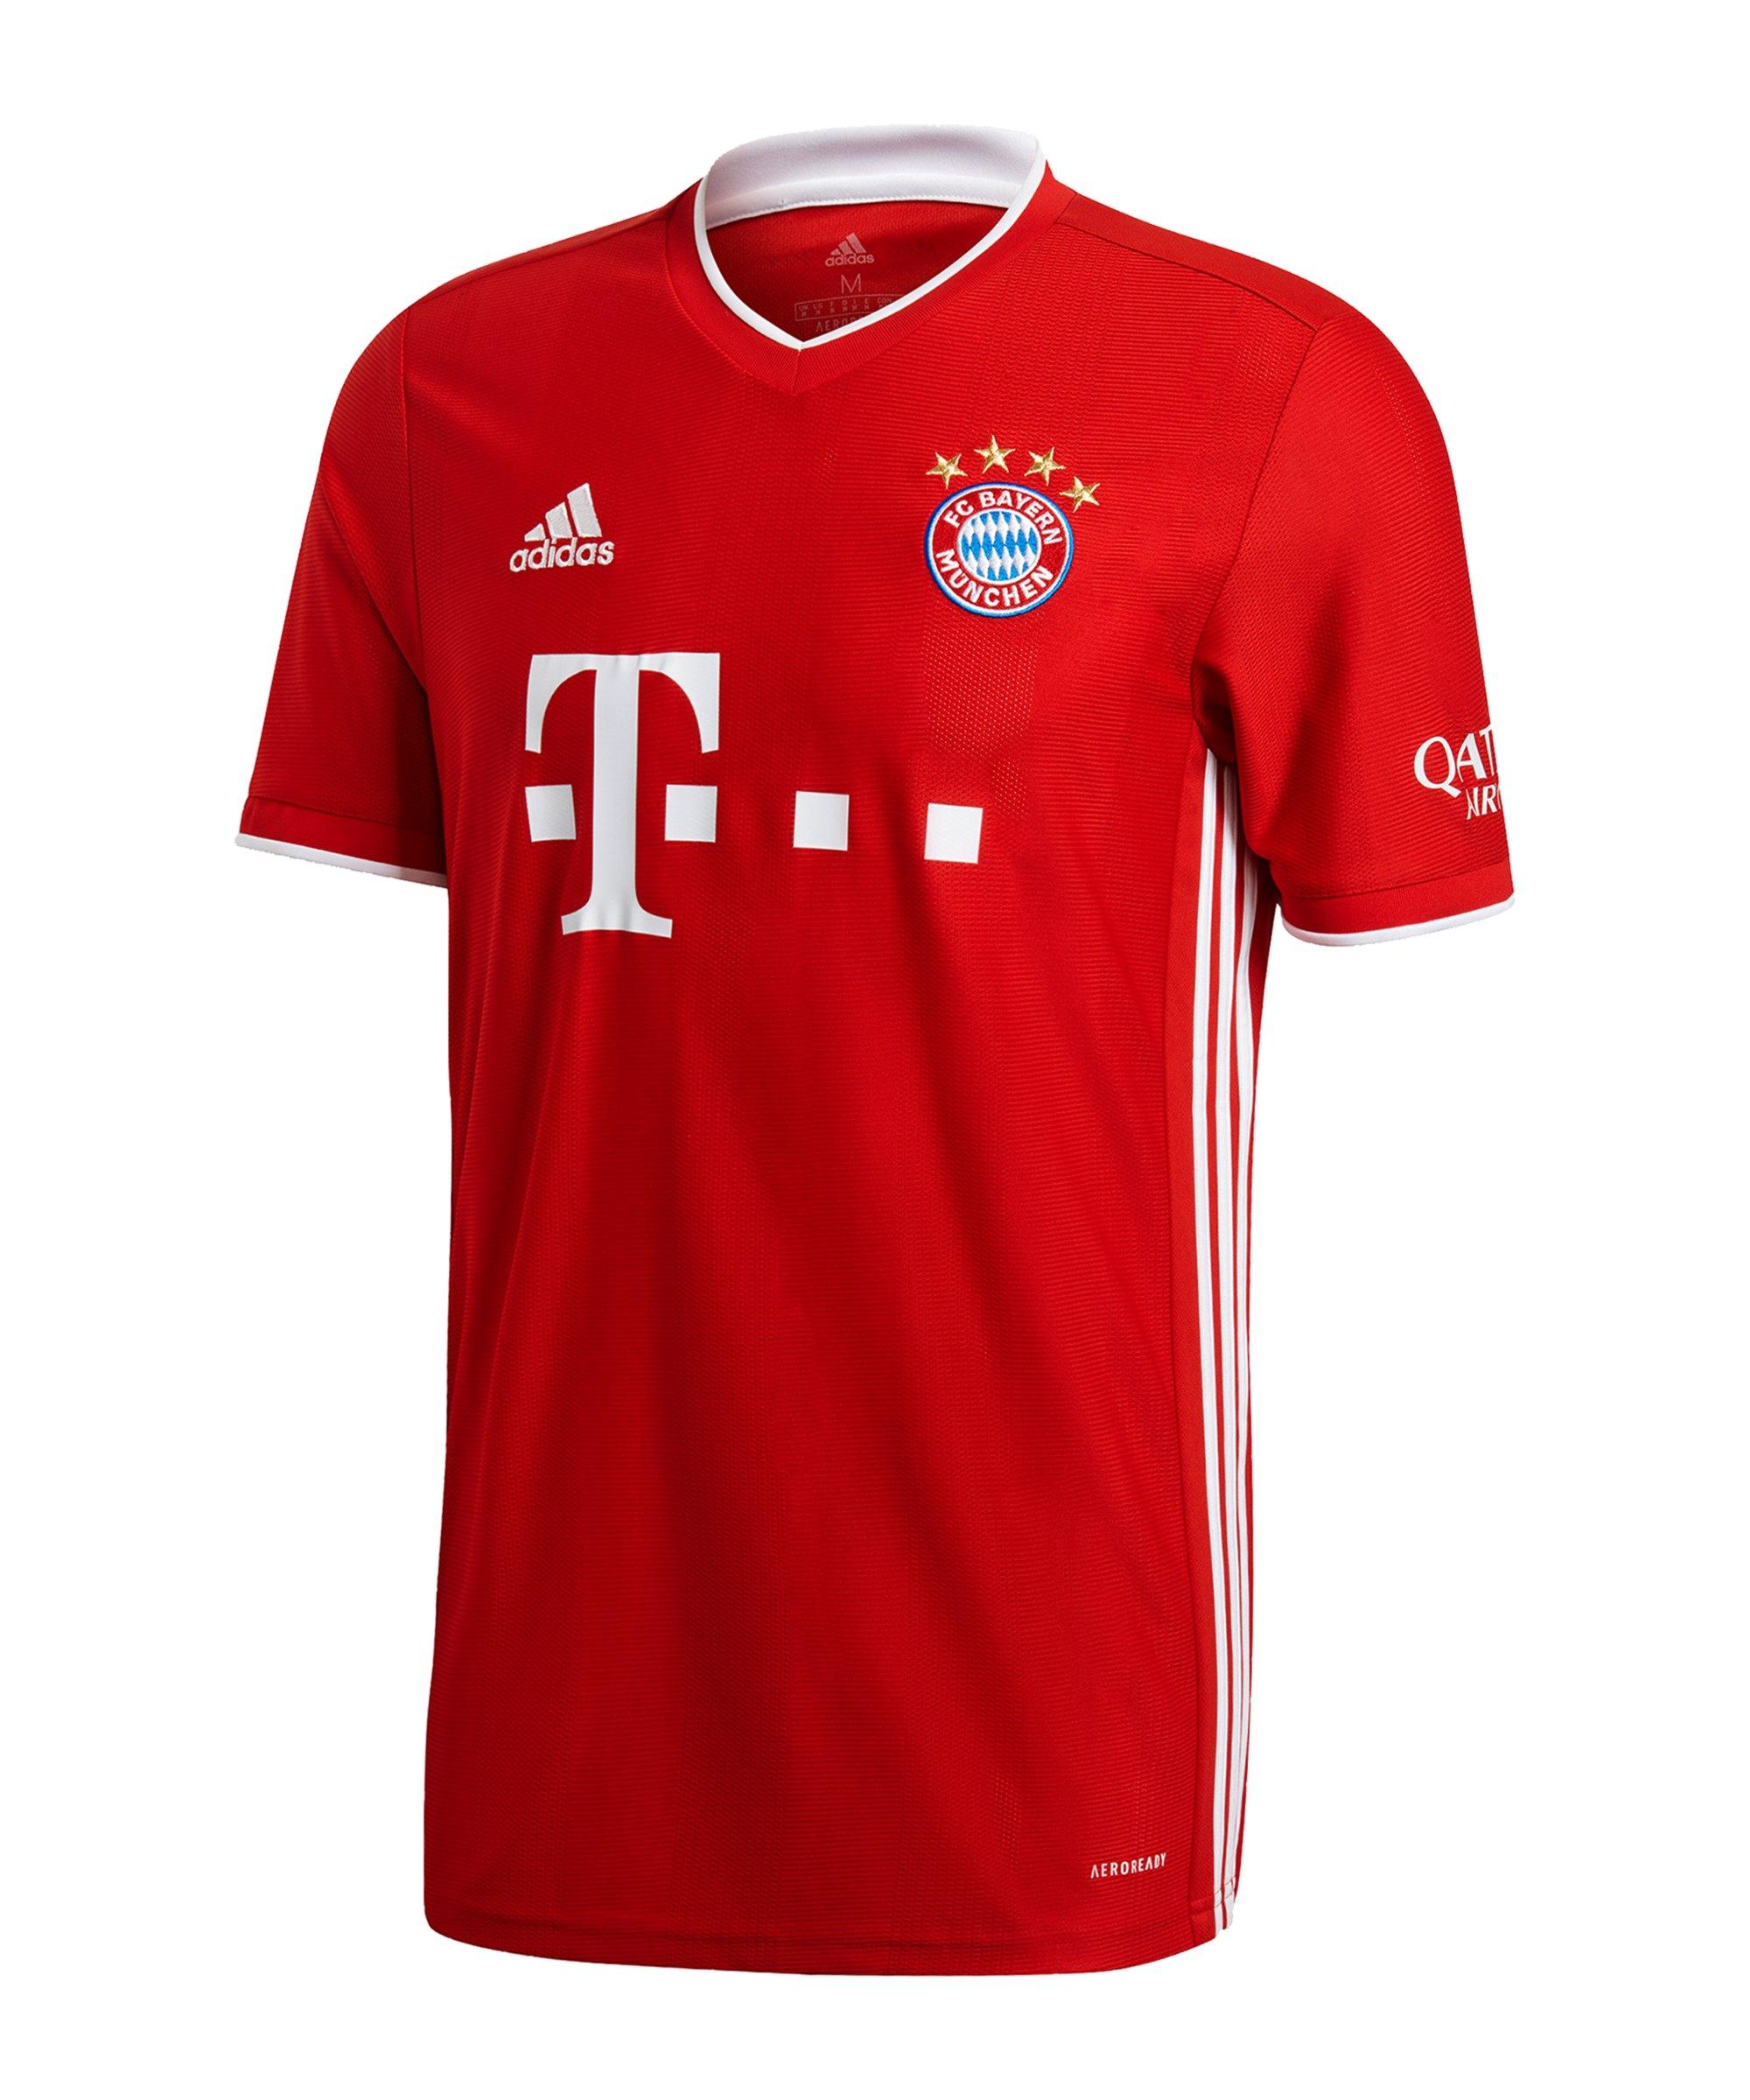 adidas FC Bayern München Trikot Home 2020/2021 Rot - rot